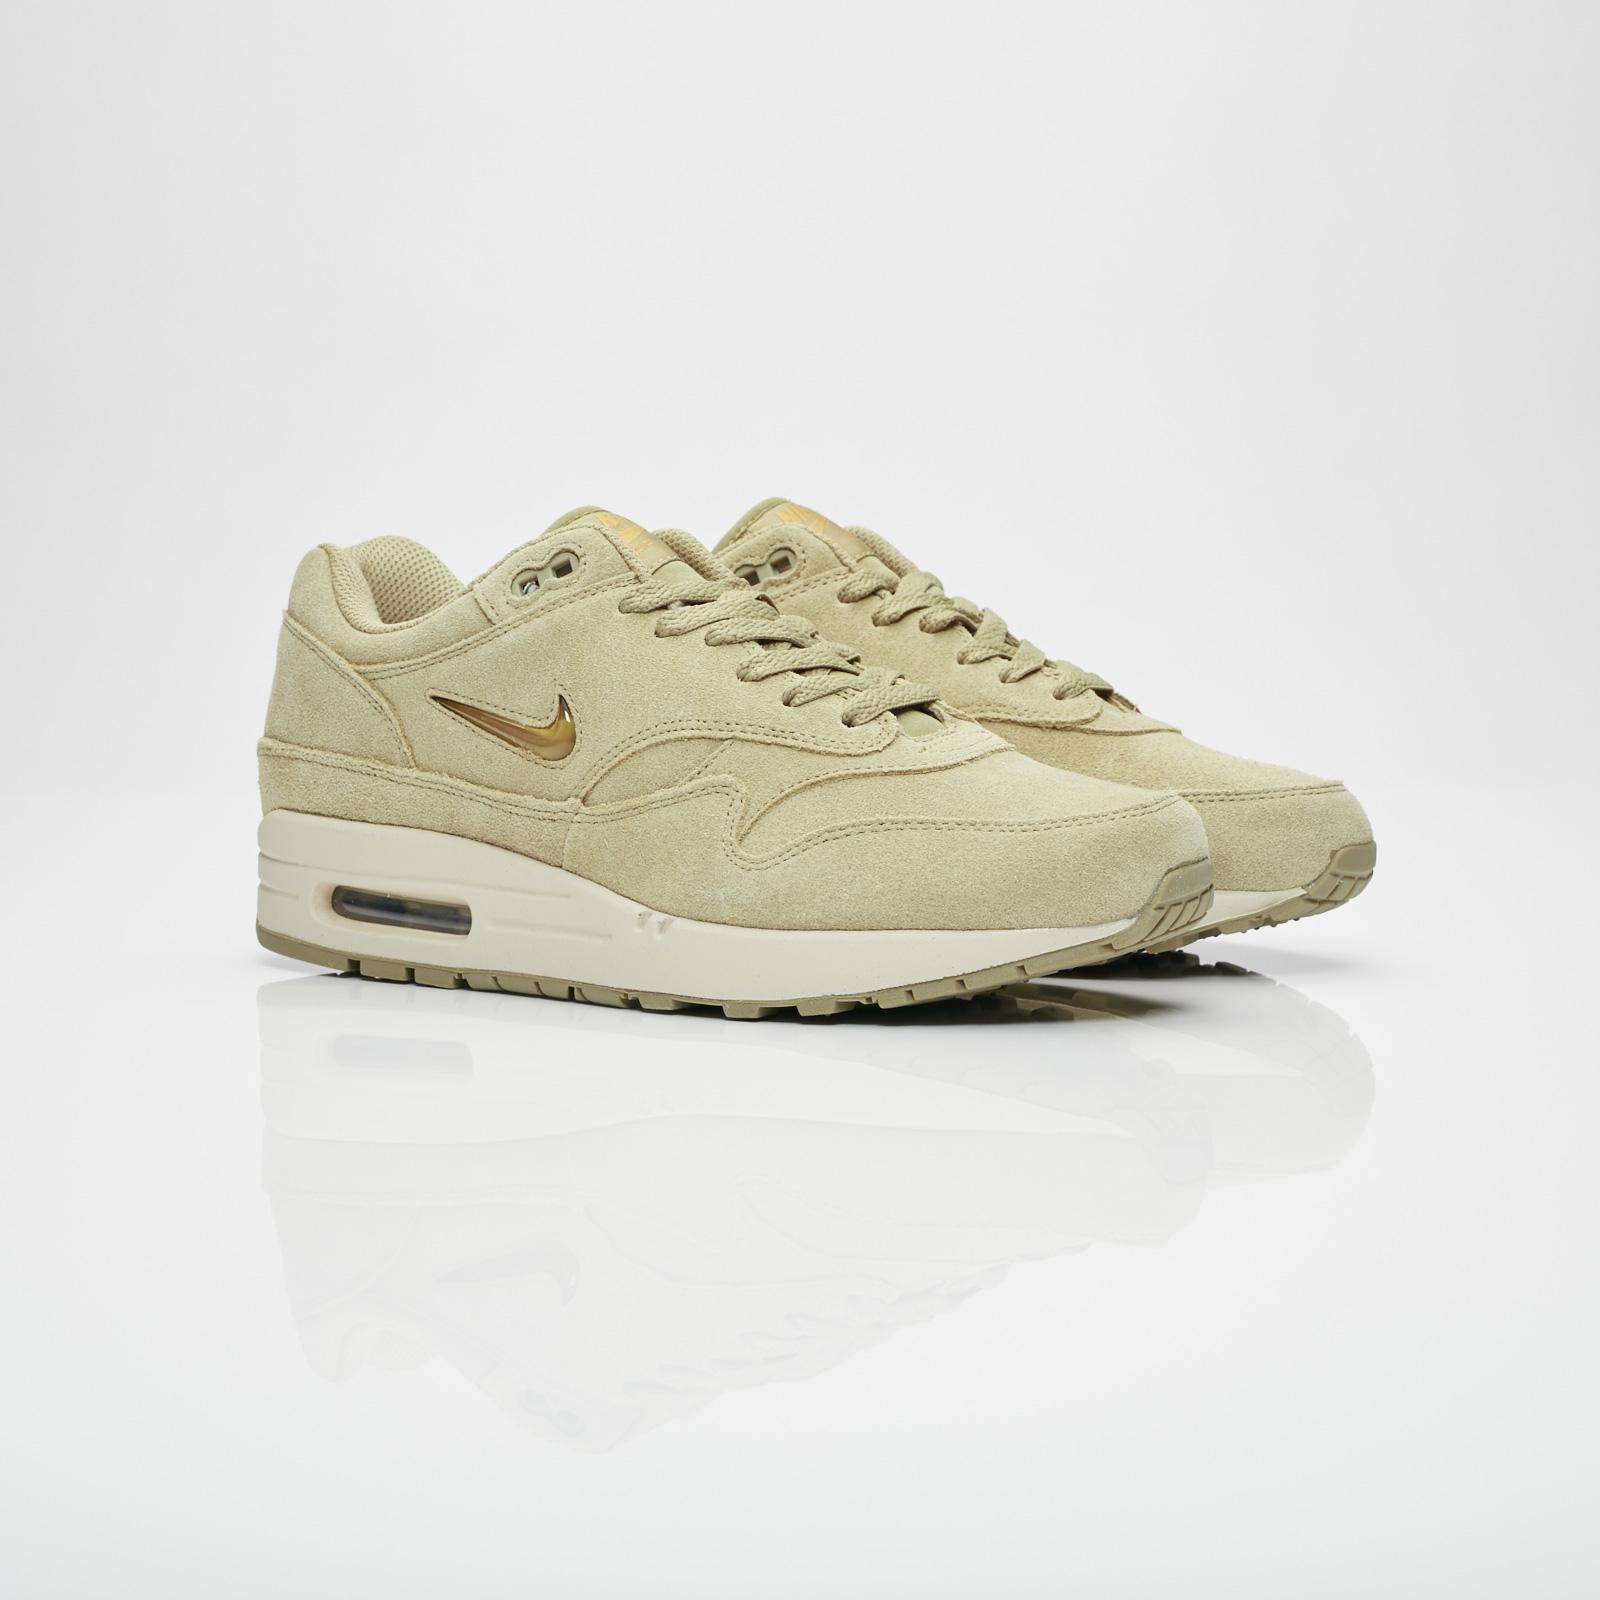 promo code 4813f c5338 Nike Sportswear Air Max 1 Premium SC